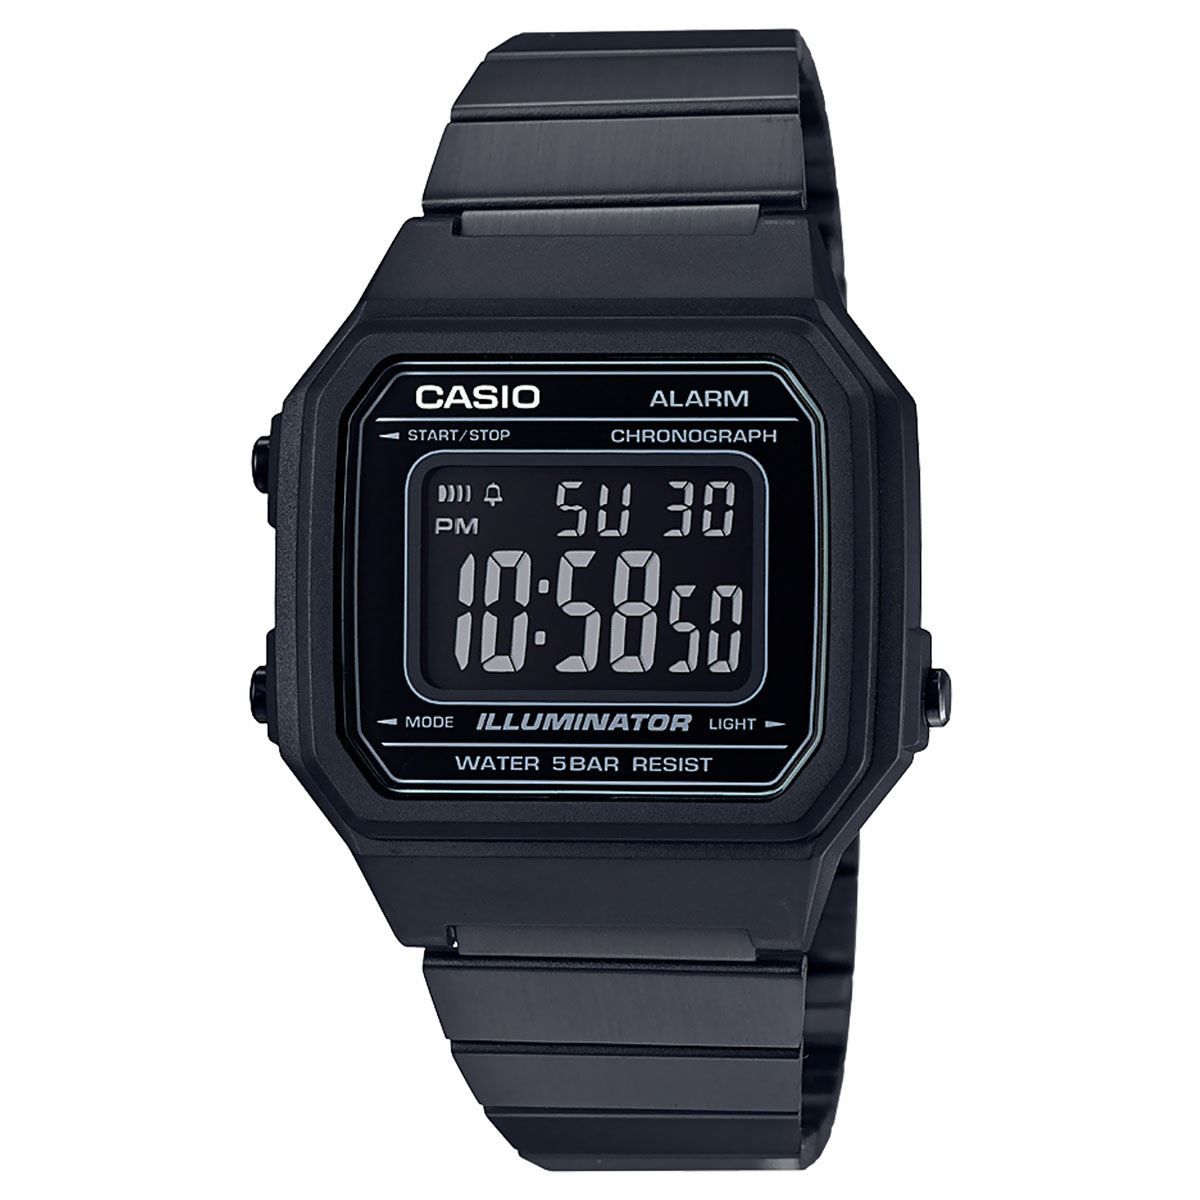 76c7cc490fd Relógio Casio B650WB-1B Black - Overcome Clothing